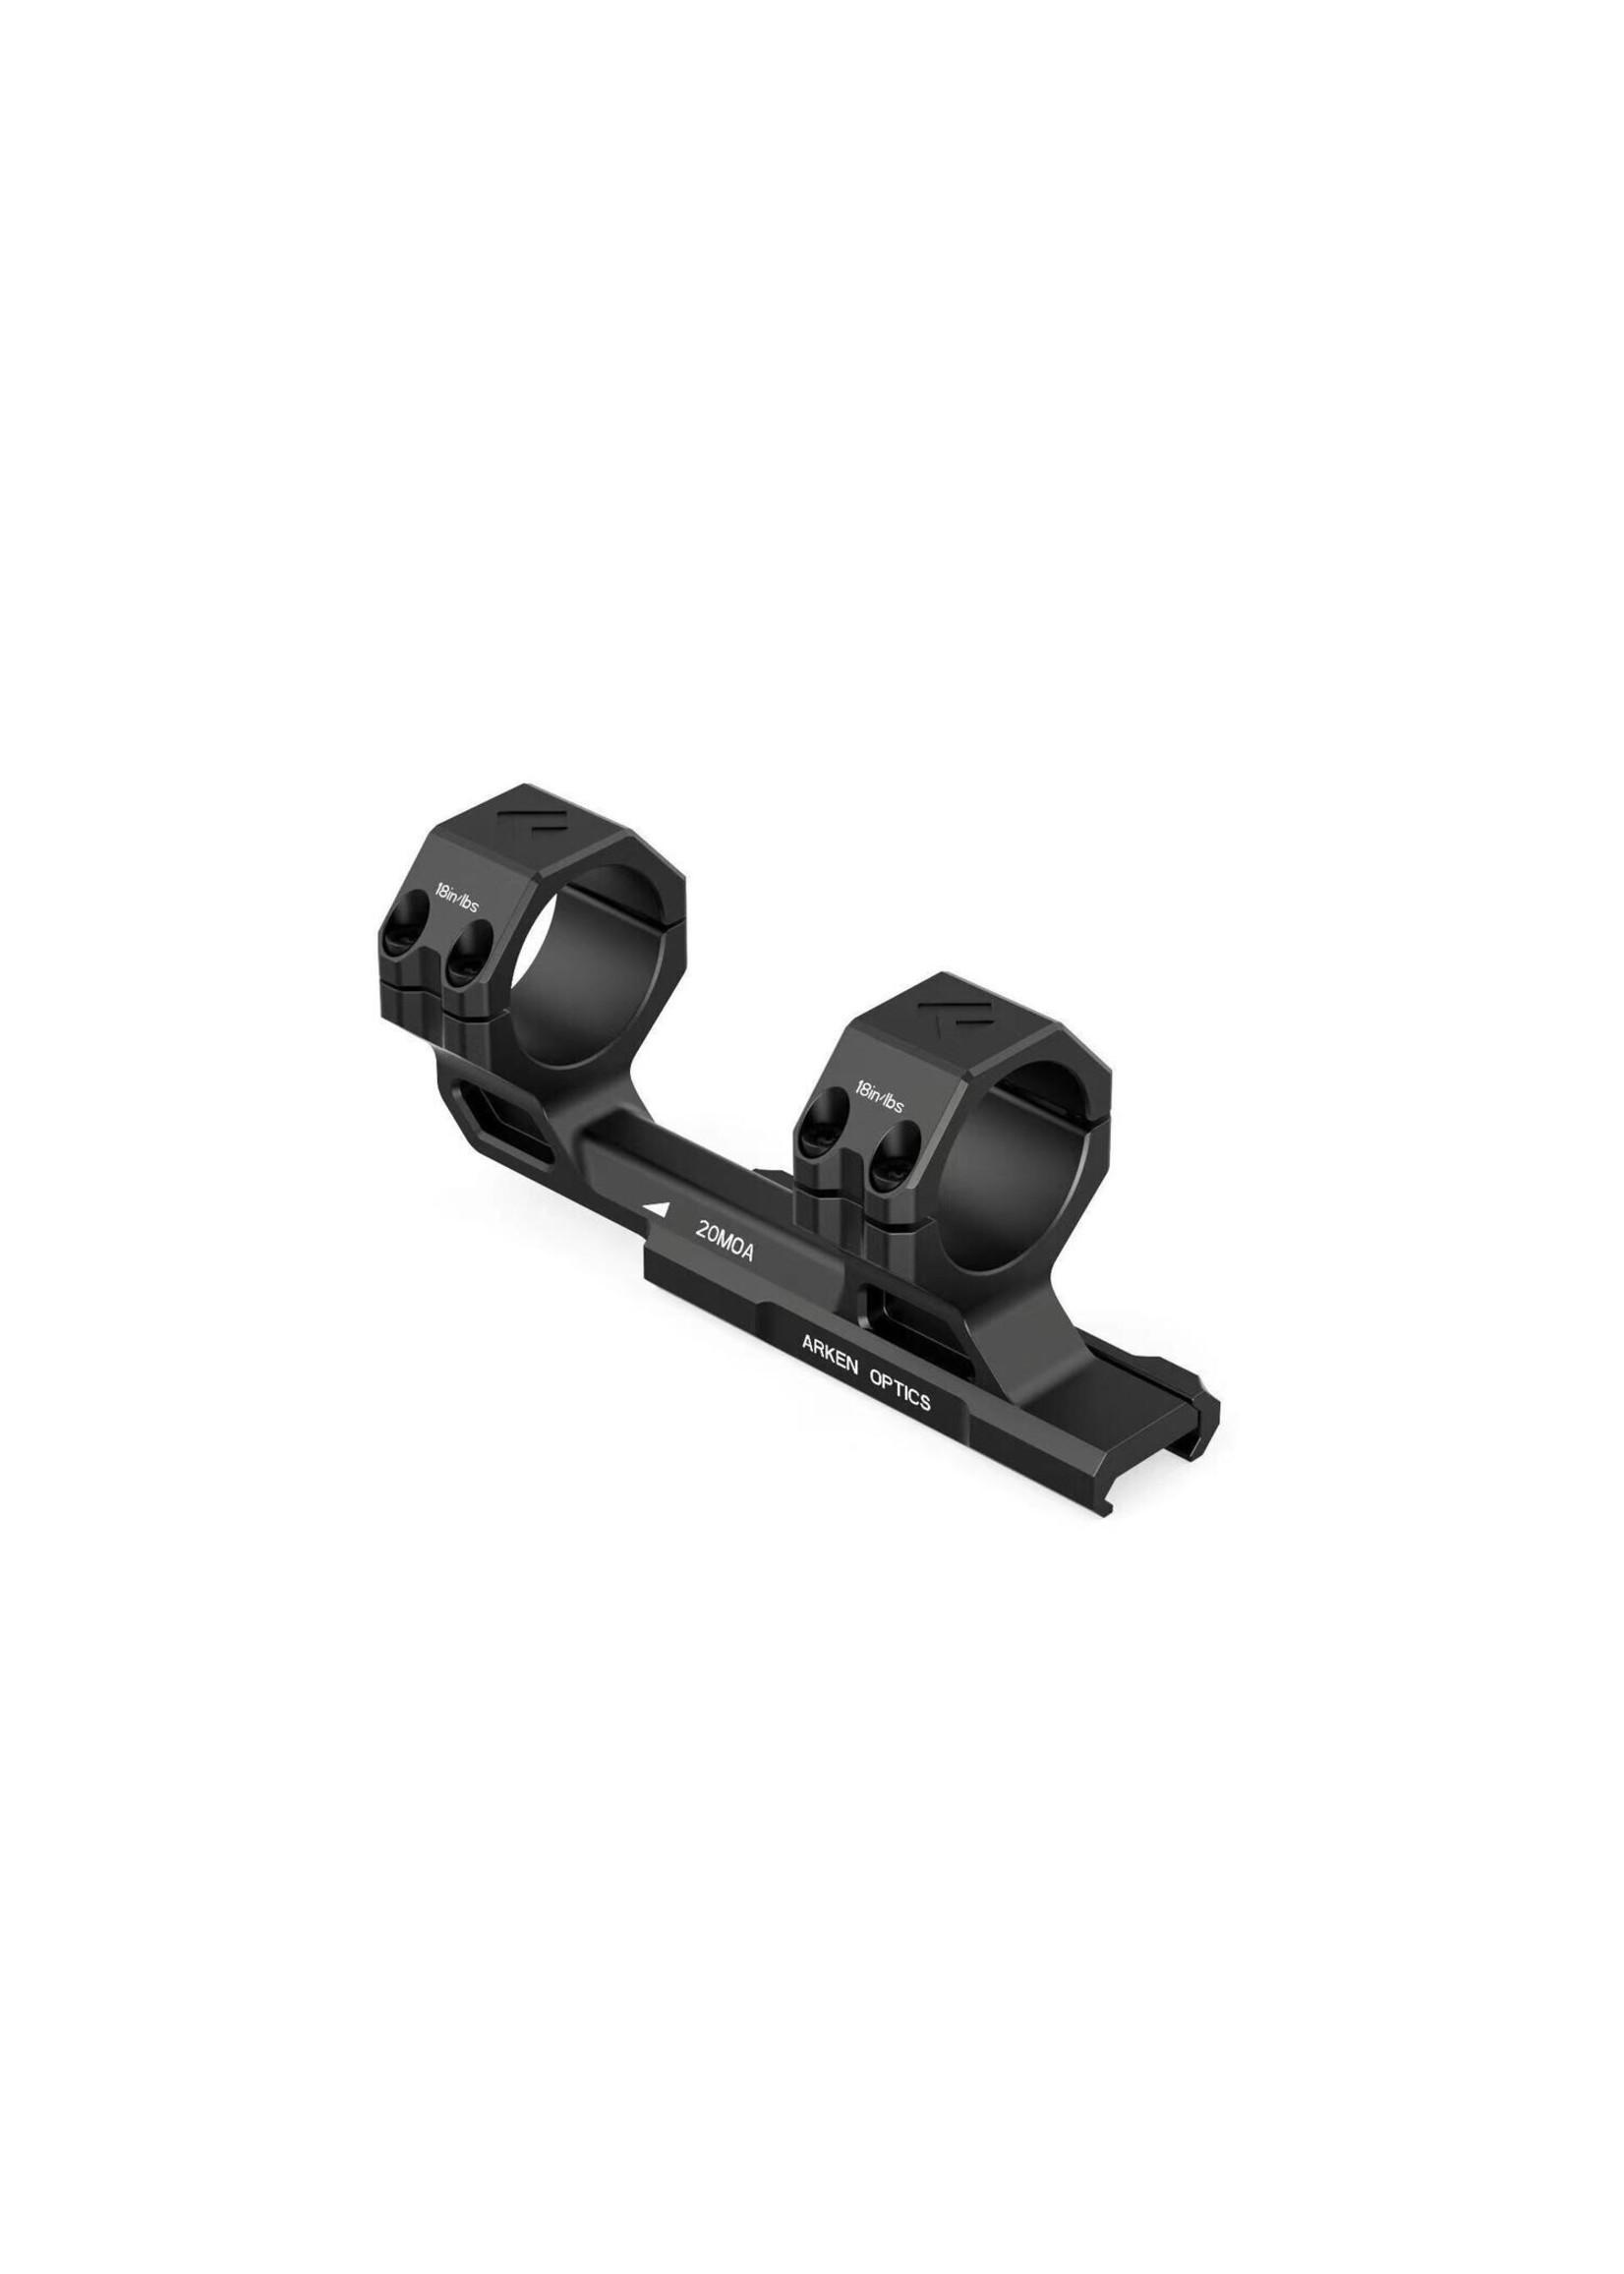 Arken Arken Optics Rigid Precision Mount 34mm - 20 MOA